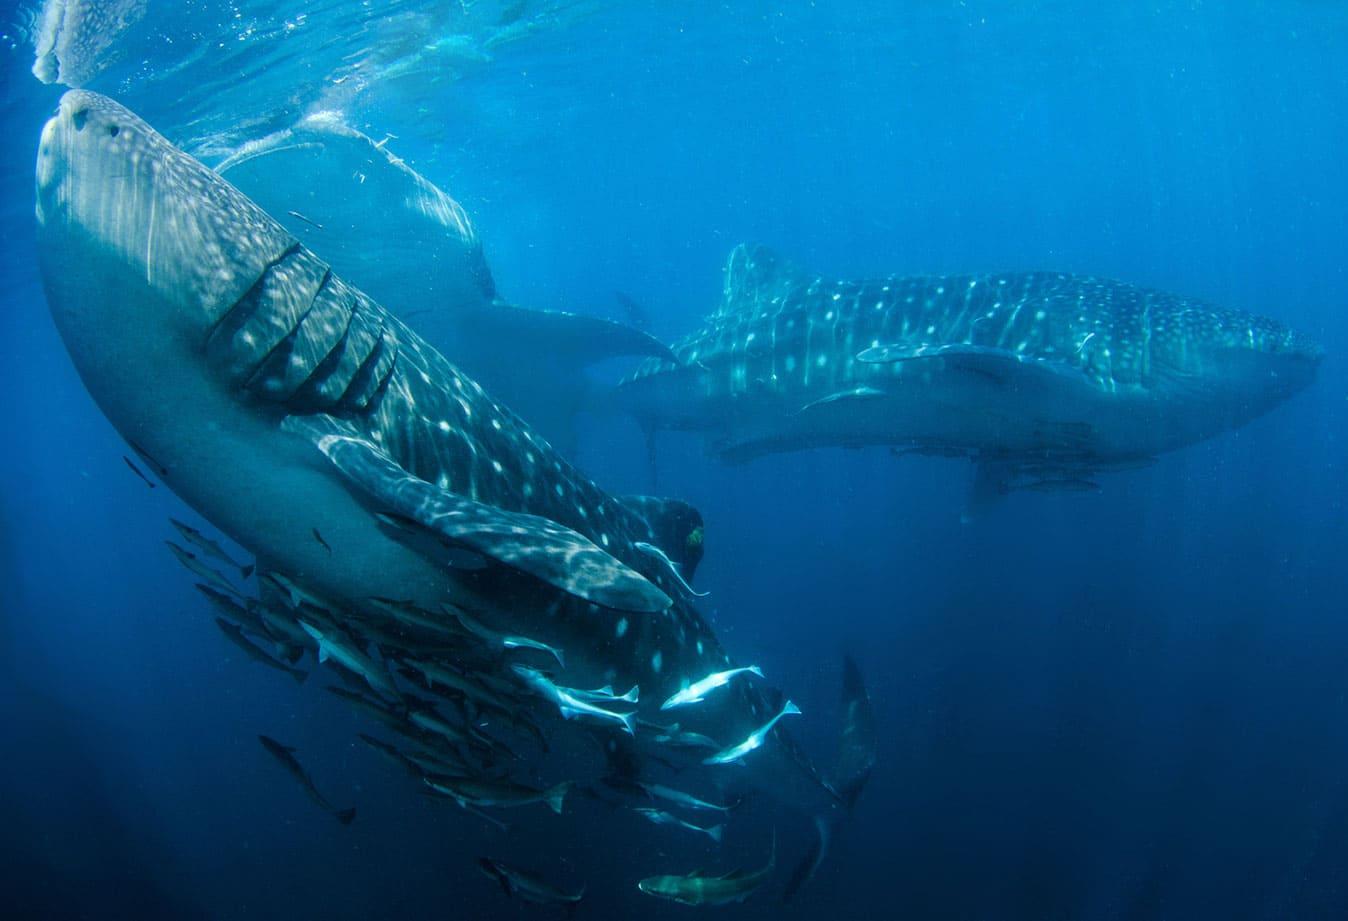 top triton bay whale shark diving konjo cruising indonesia island cruise liveaboard scuba yacht charter luxury raja ampat misool halmahera komodo hammerhead banda sea